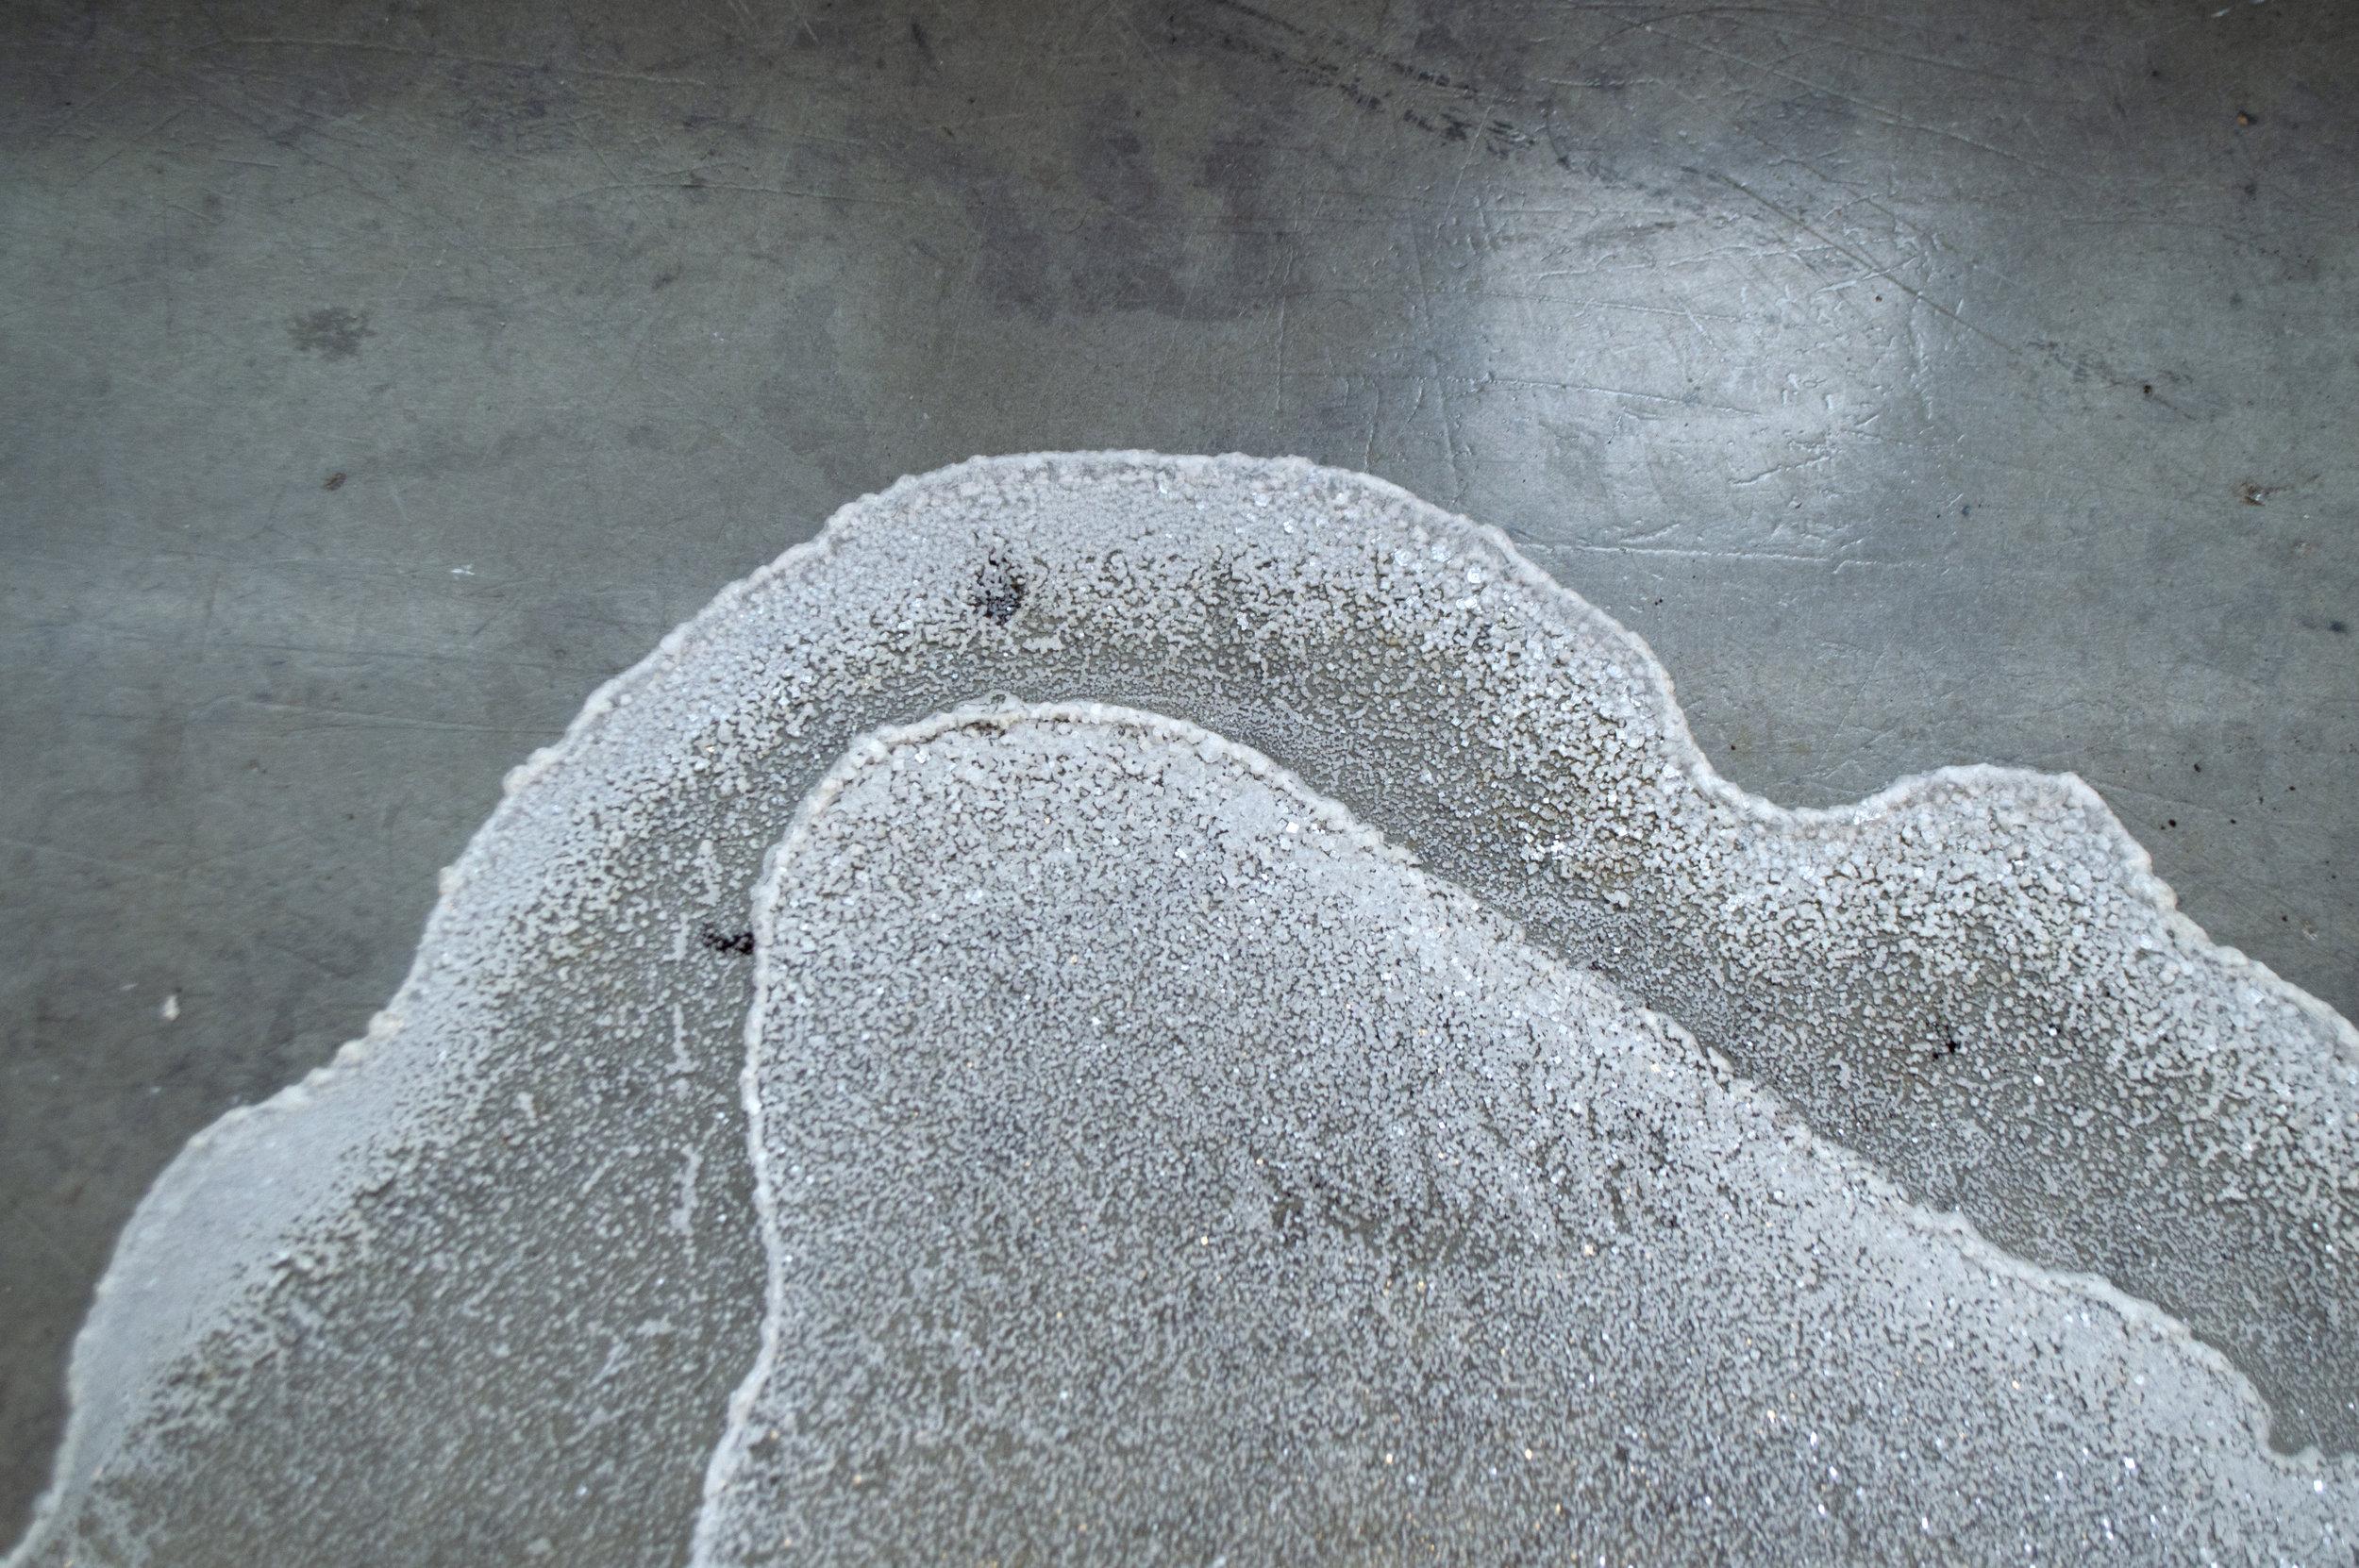 Taxidermy   2018, Earth, salt, glass, steel, water, vinyl coordinates